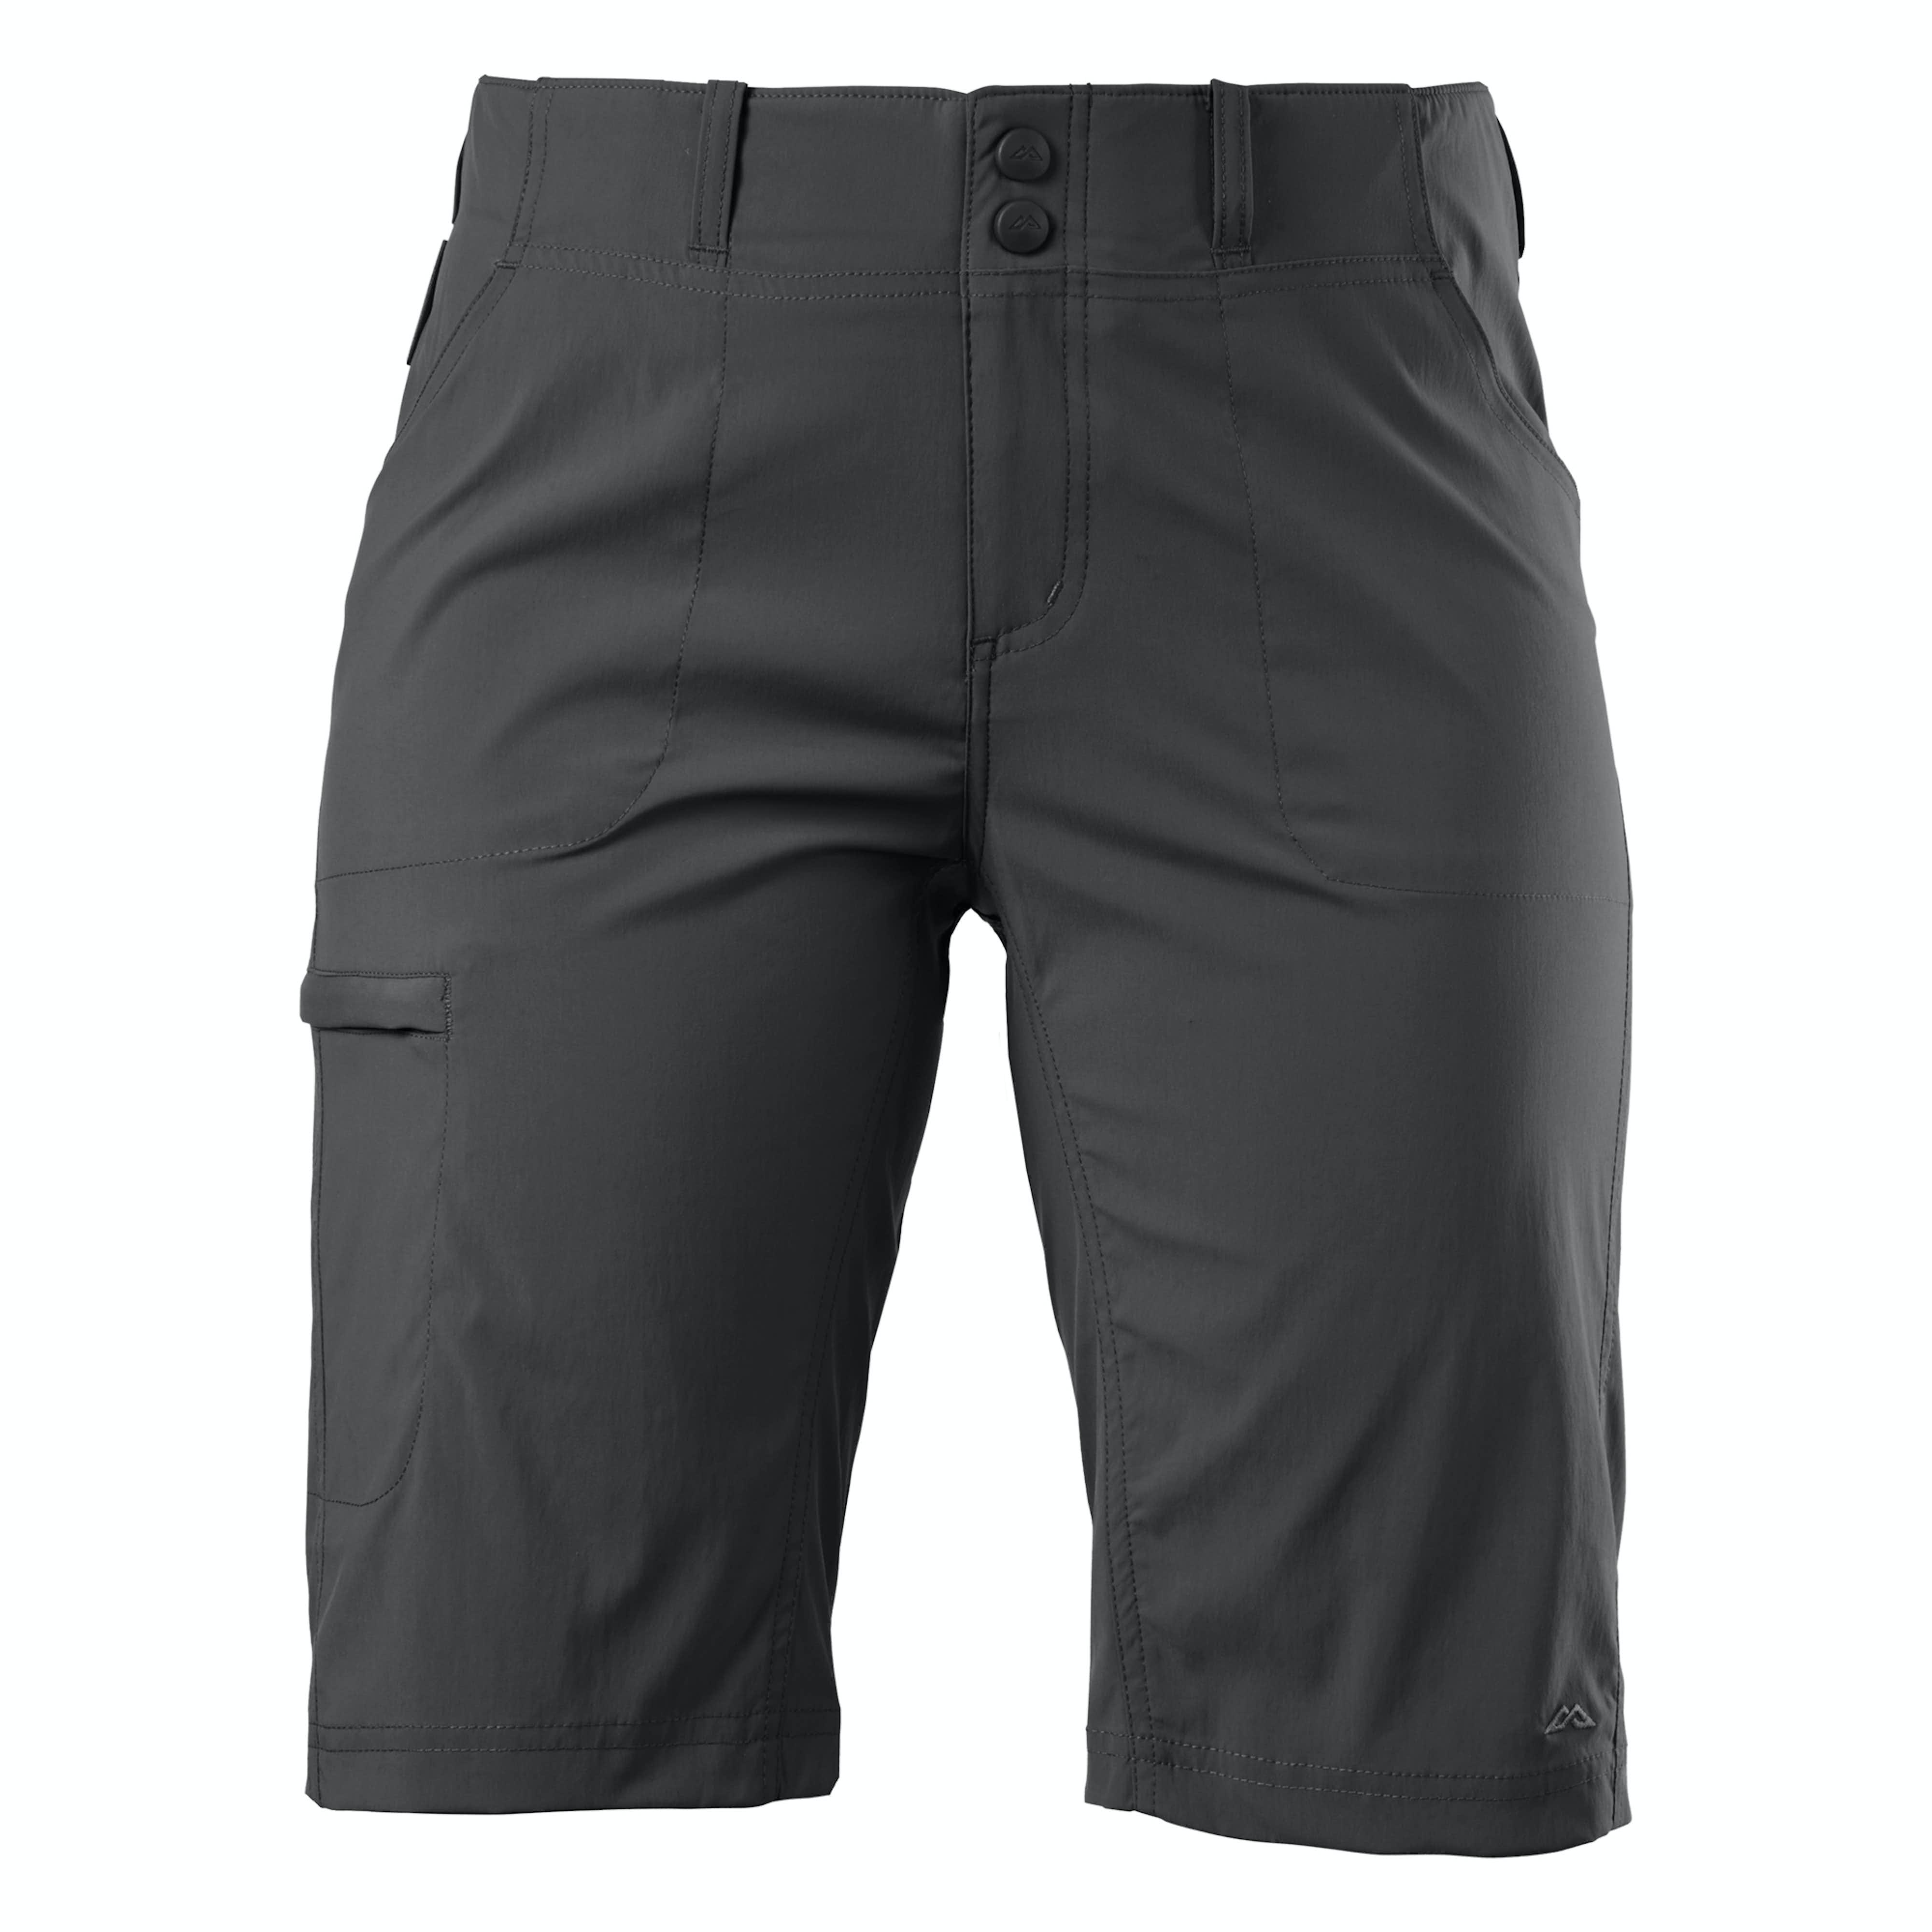 8f4a6e301e Praca Women's Hiking Shorts v2 - Black